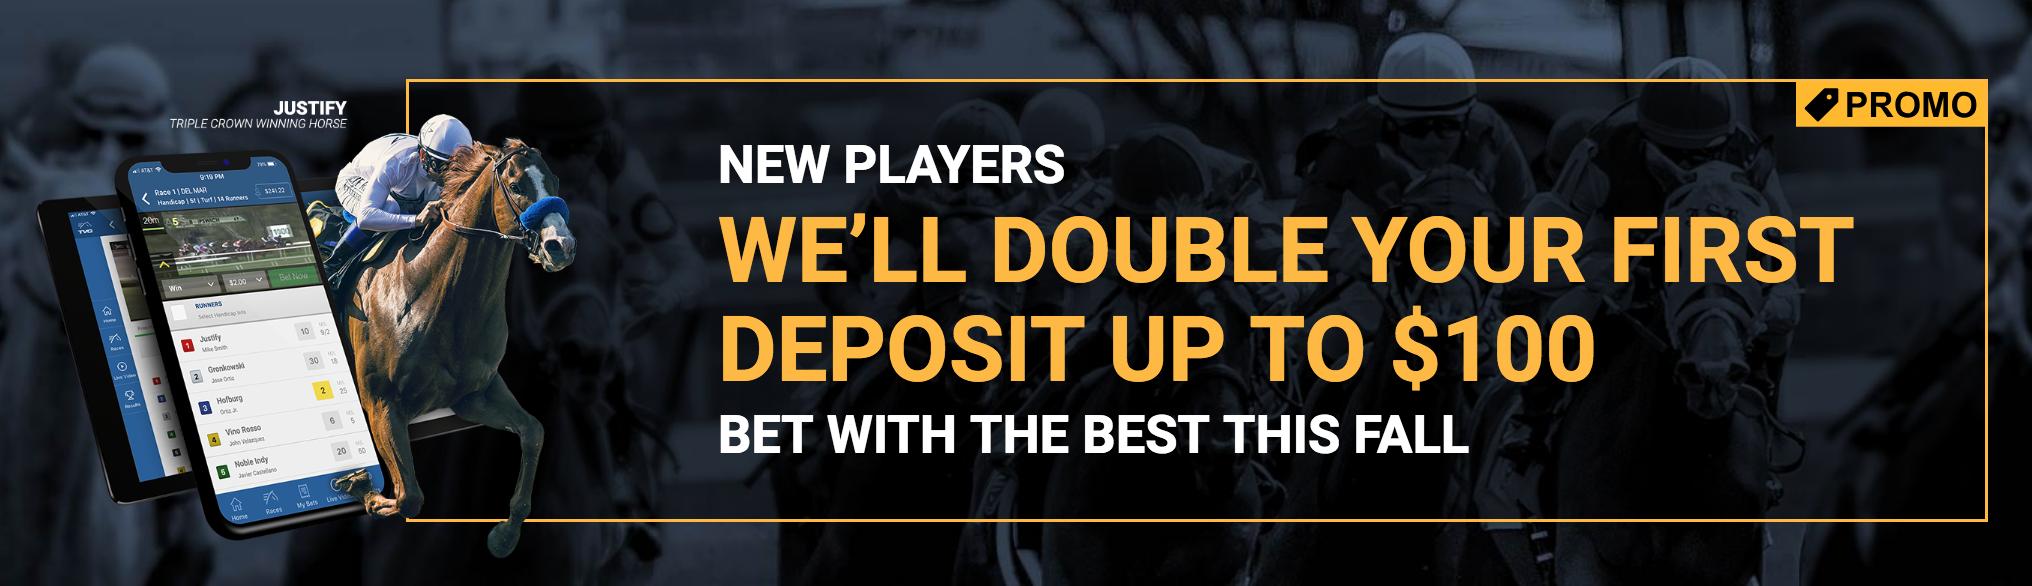 TVG promo code double your deposit